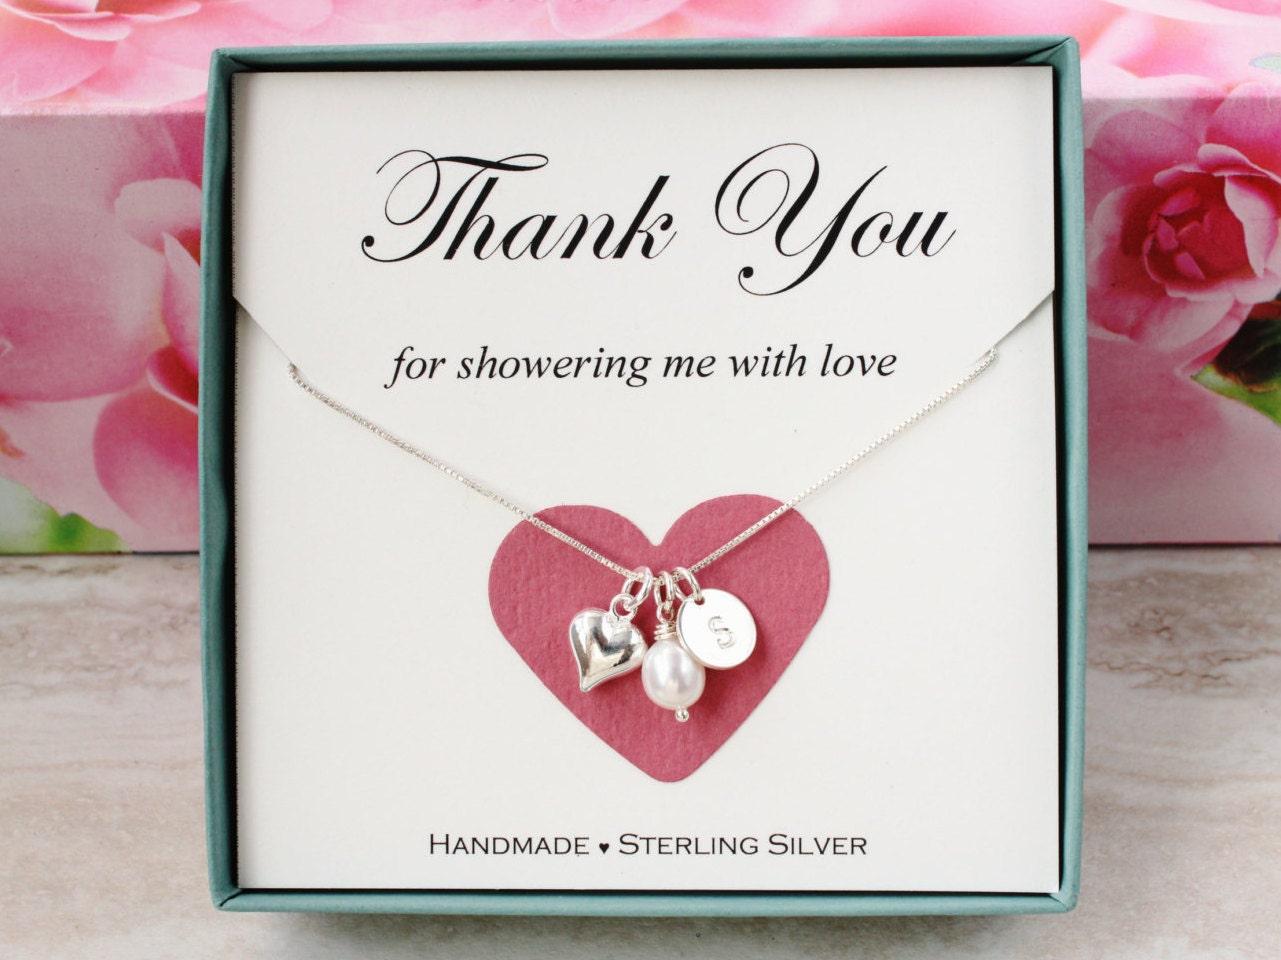 Baby Shower Hostess Gift Ideas Etsy : Bridal shower hostess gift for baby thank you